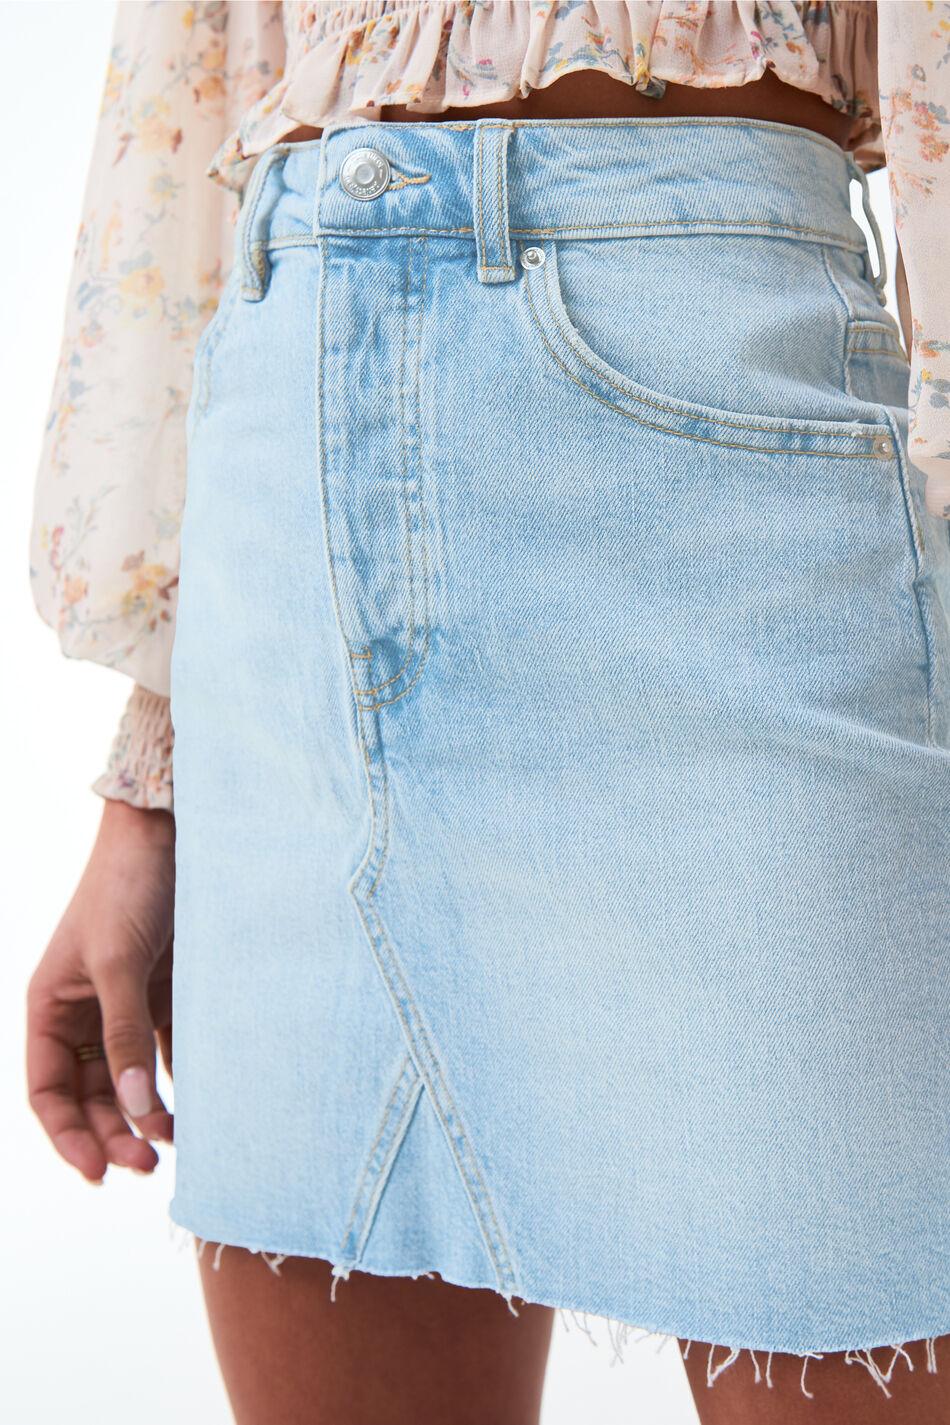 Gina Tricot Vintage short denim skirt